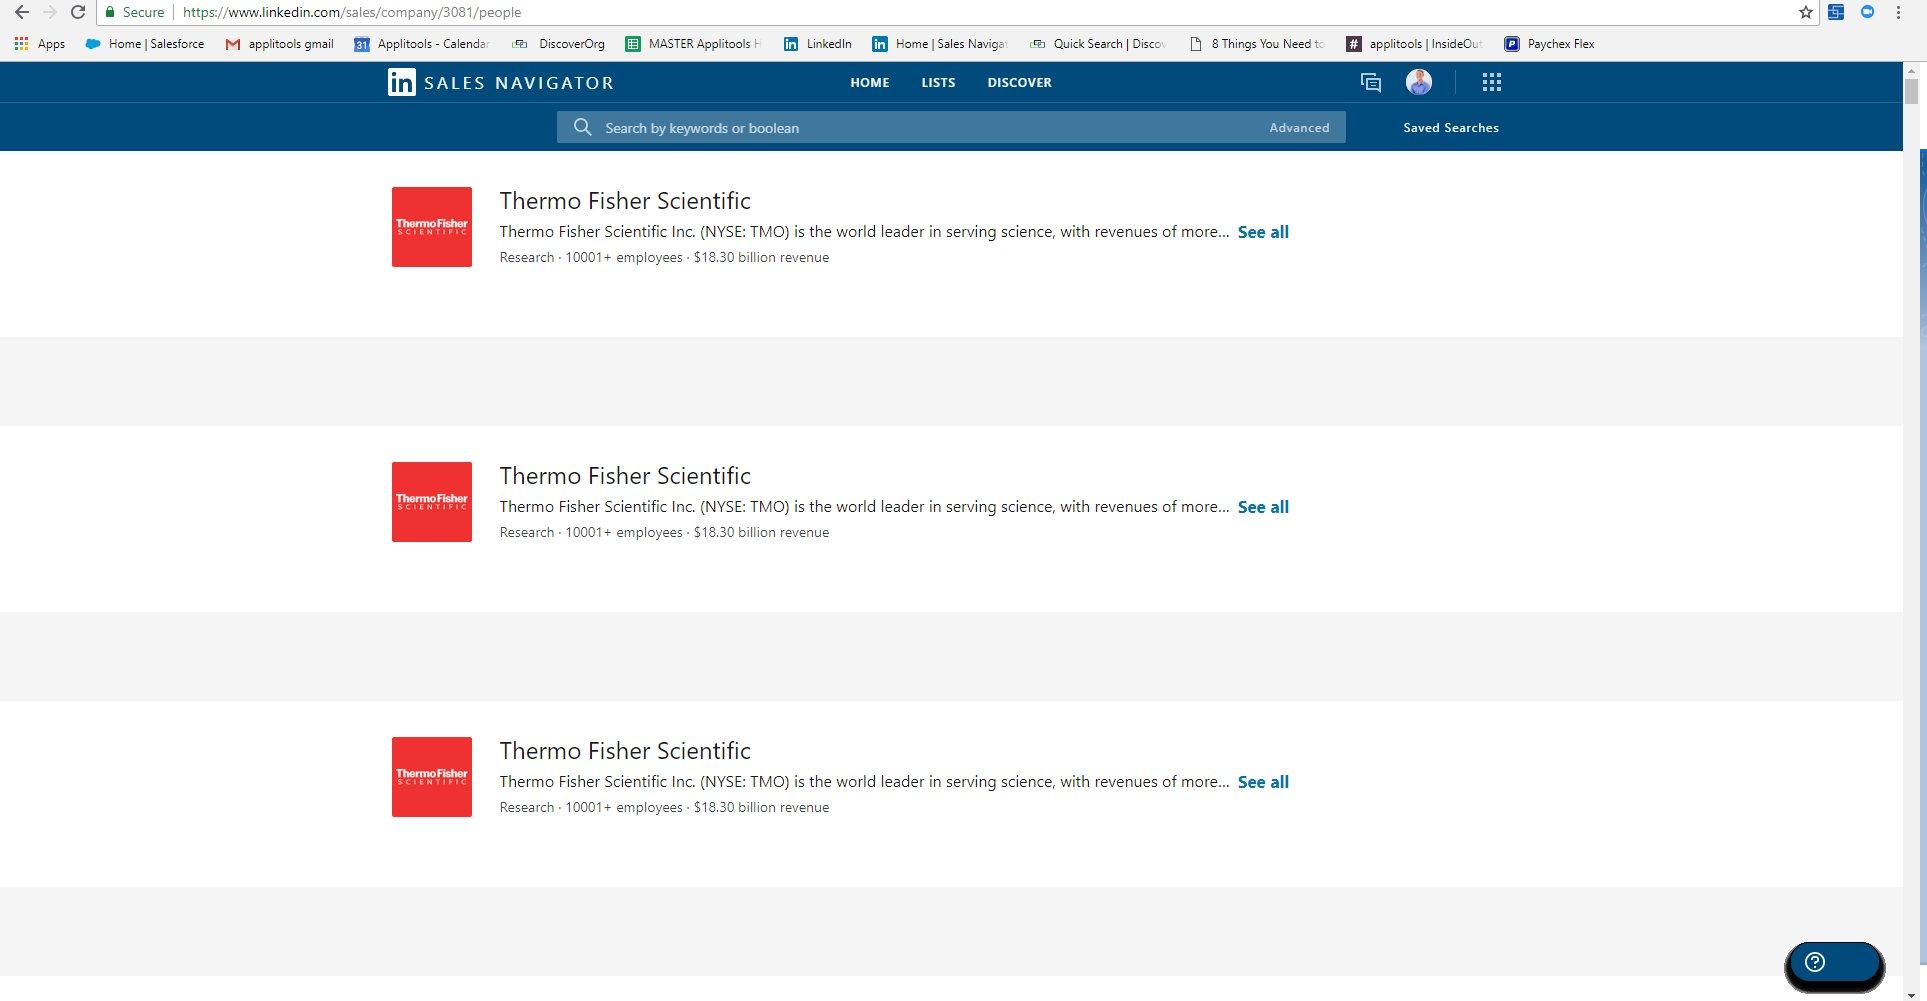 Repeated company listing on LinkedIn